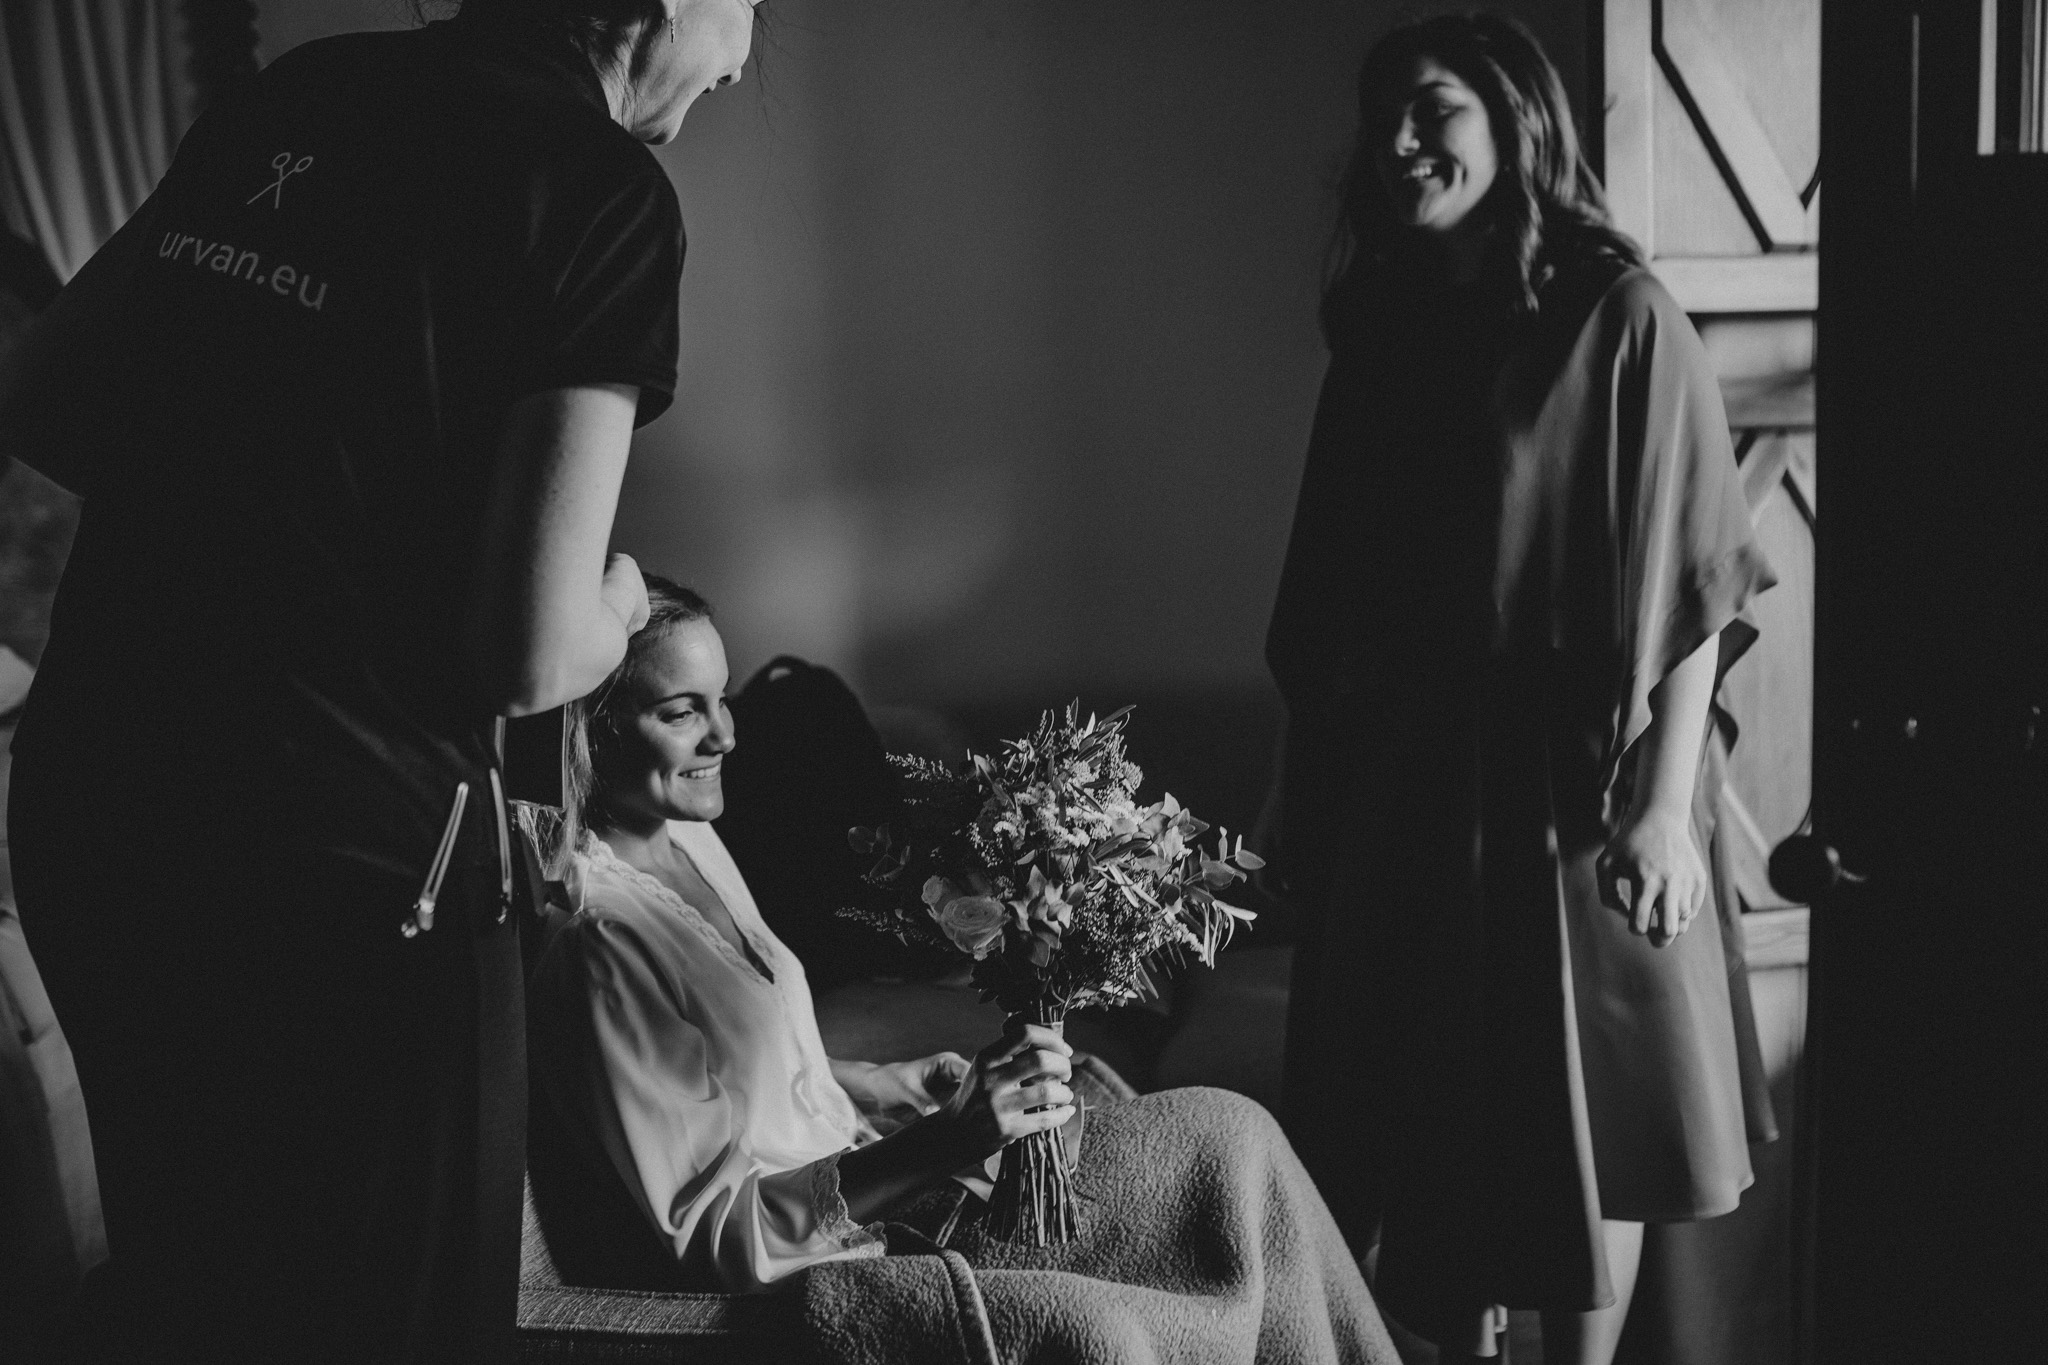 fotografia-boda-wedding-photographer-spain-concorazon-9